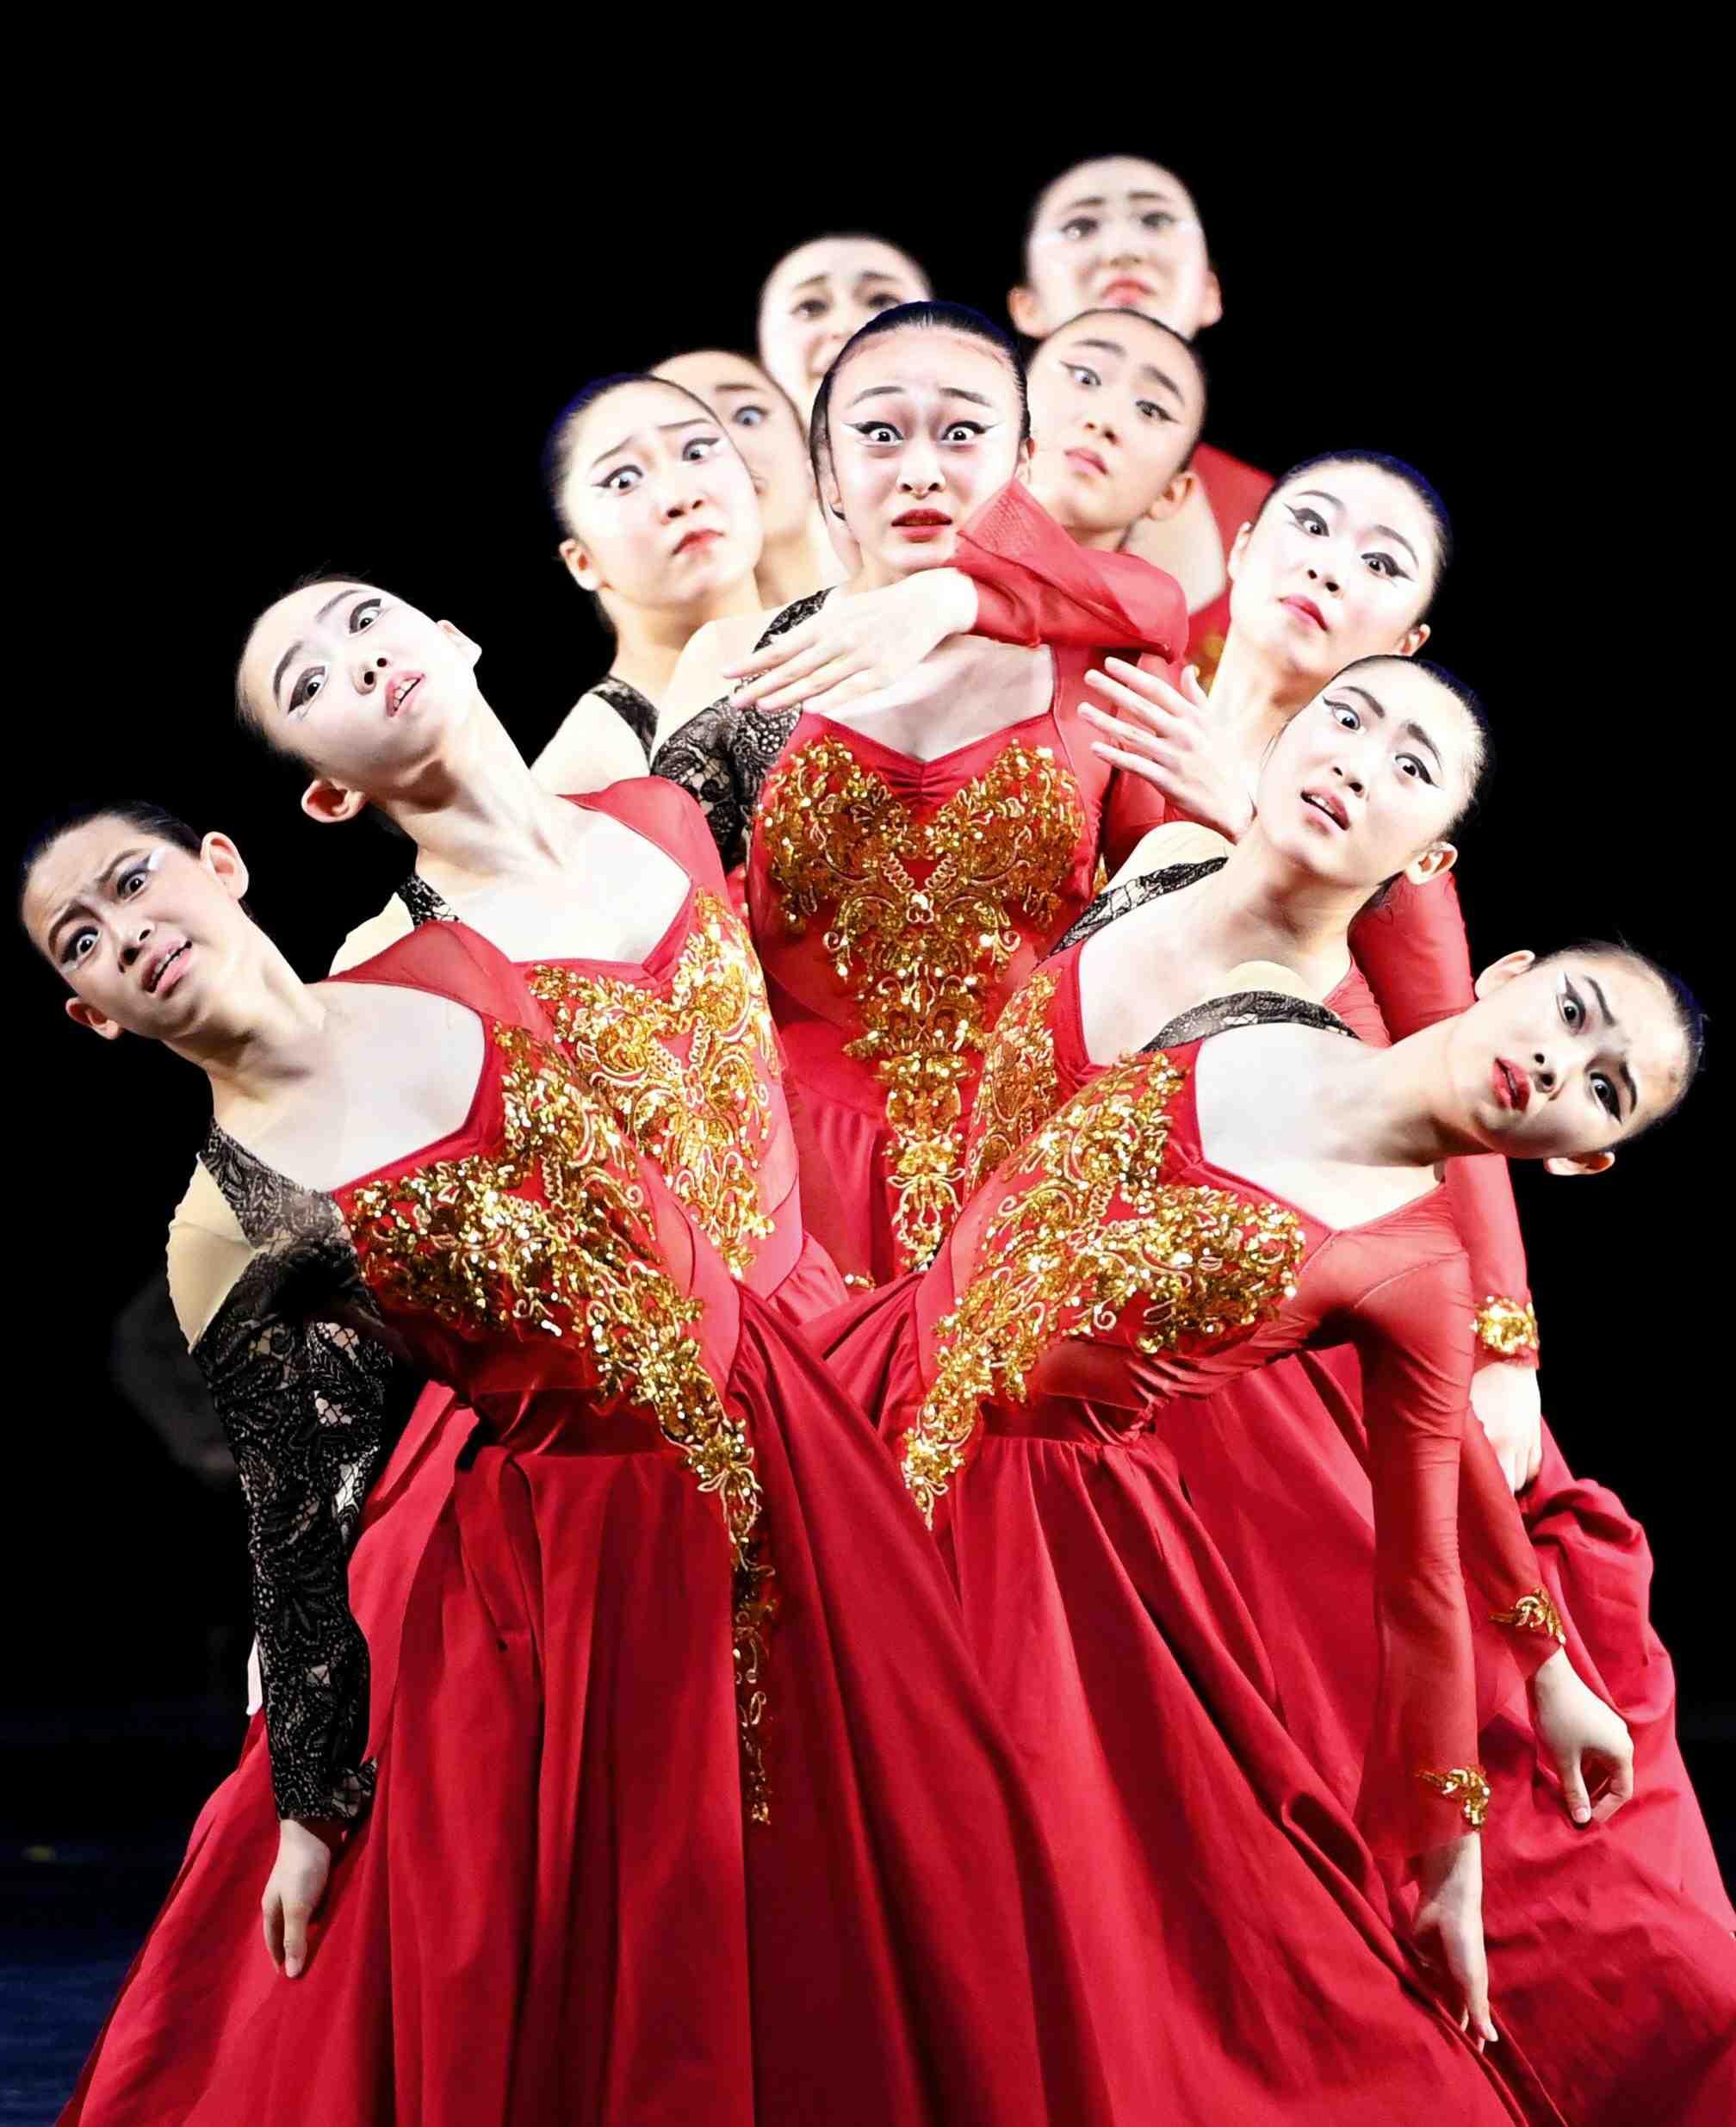 Japan High School Dance Club Competition 004